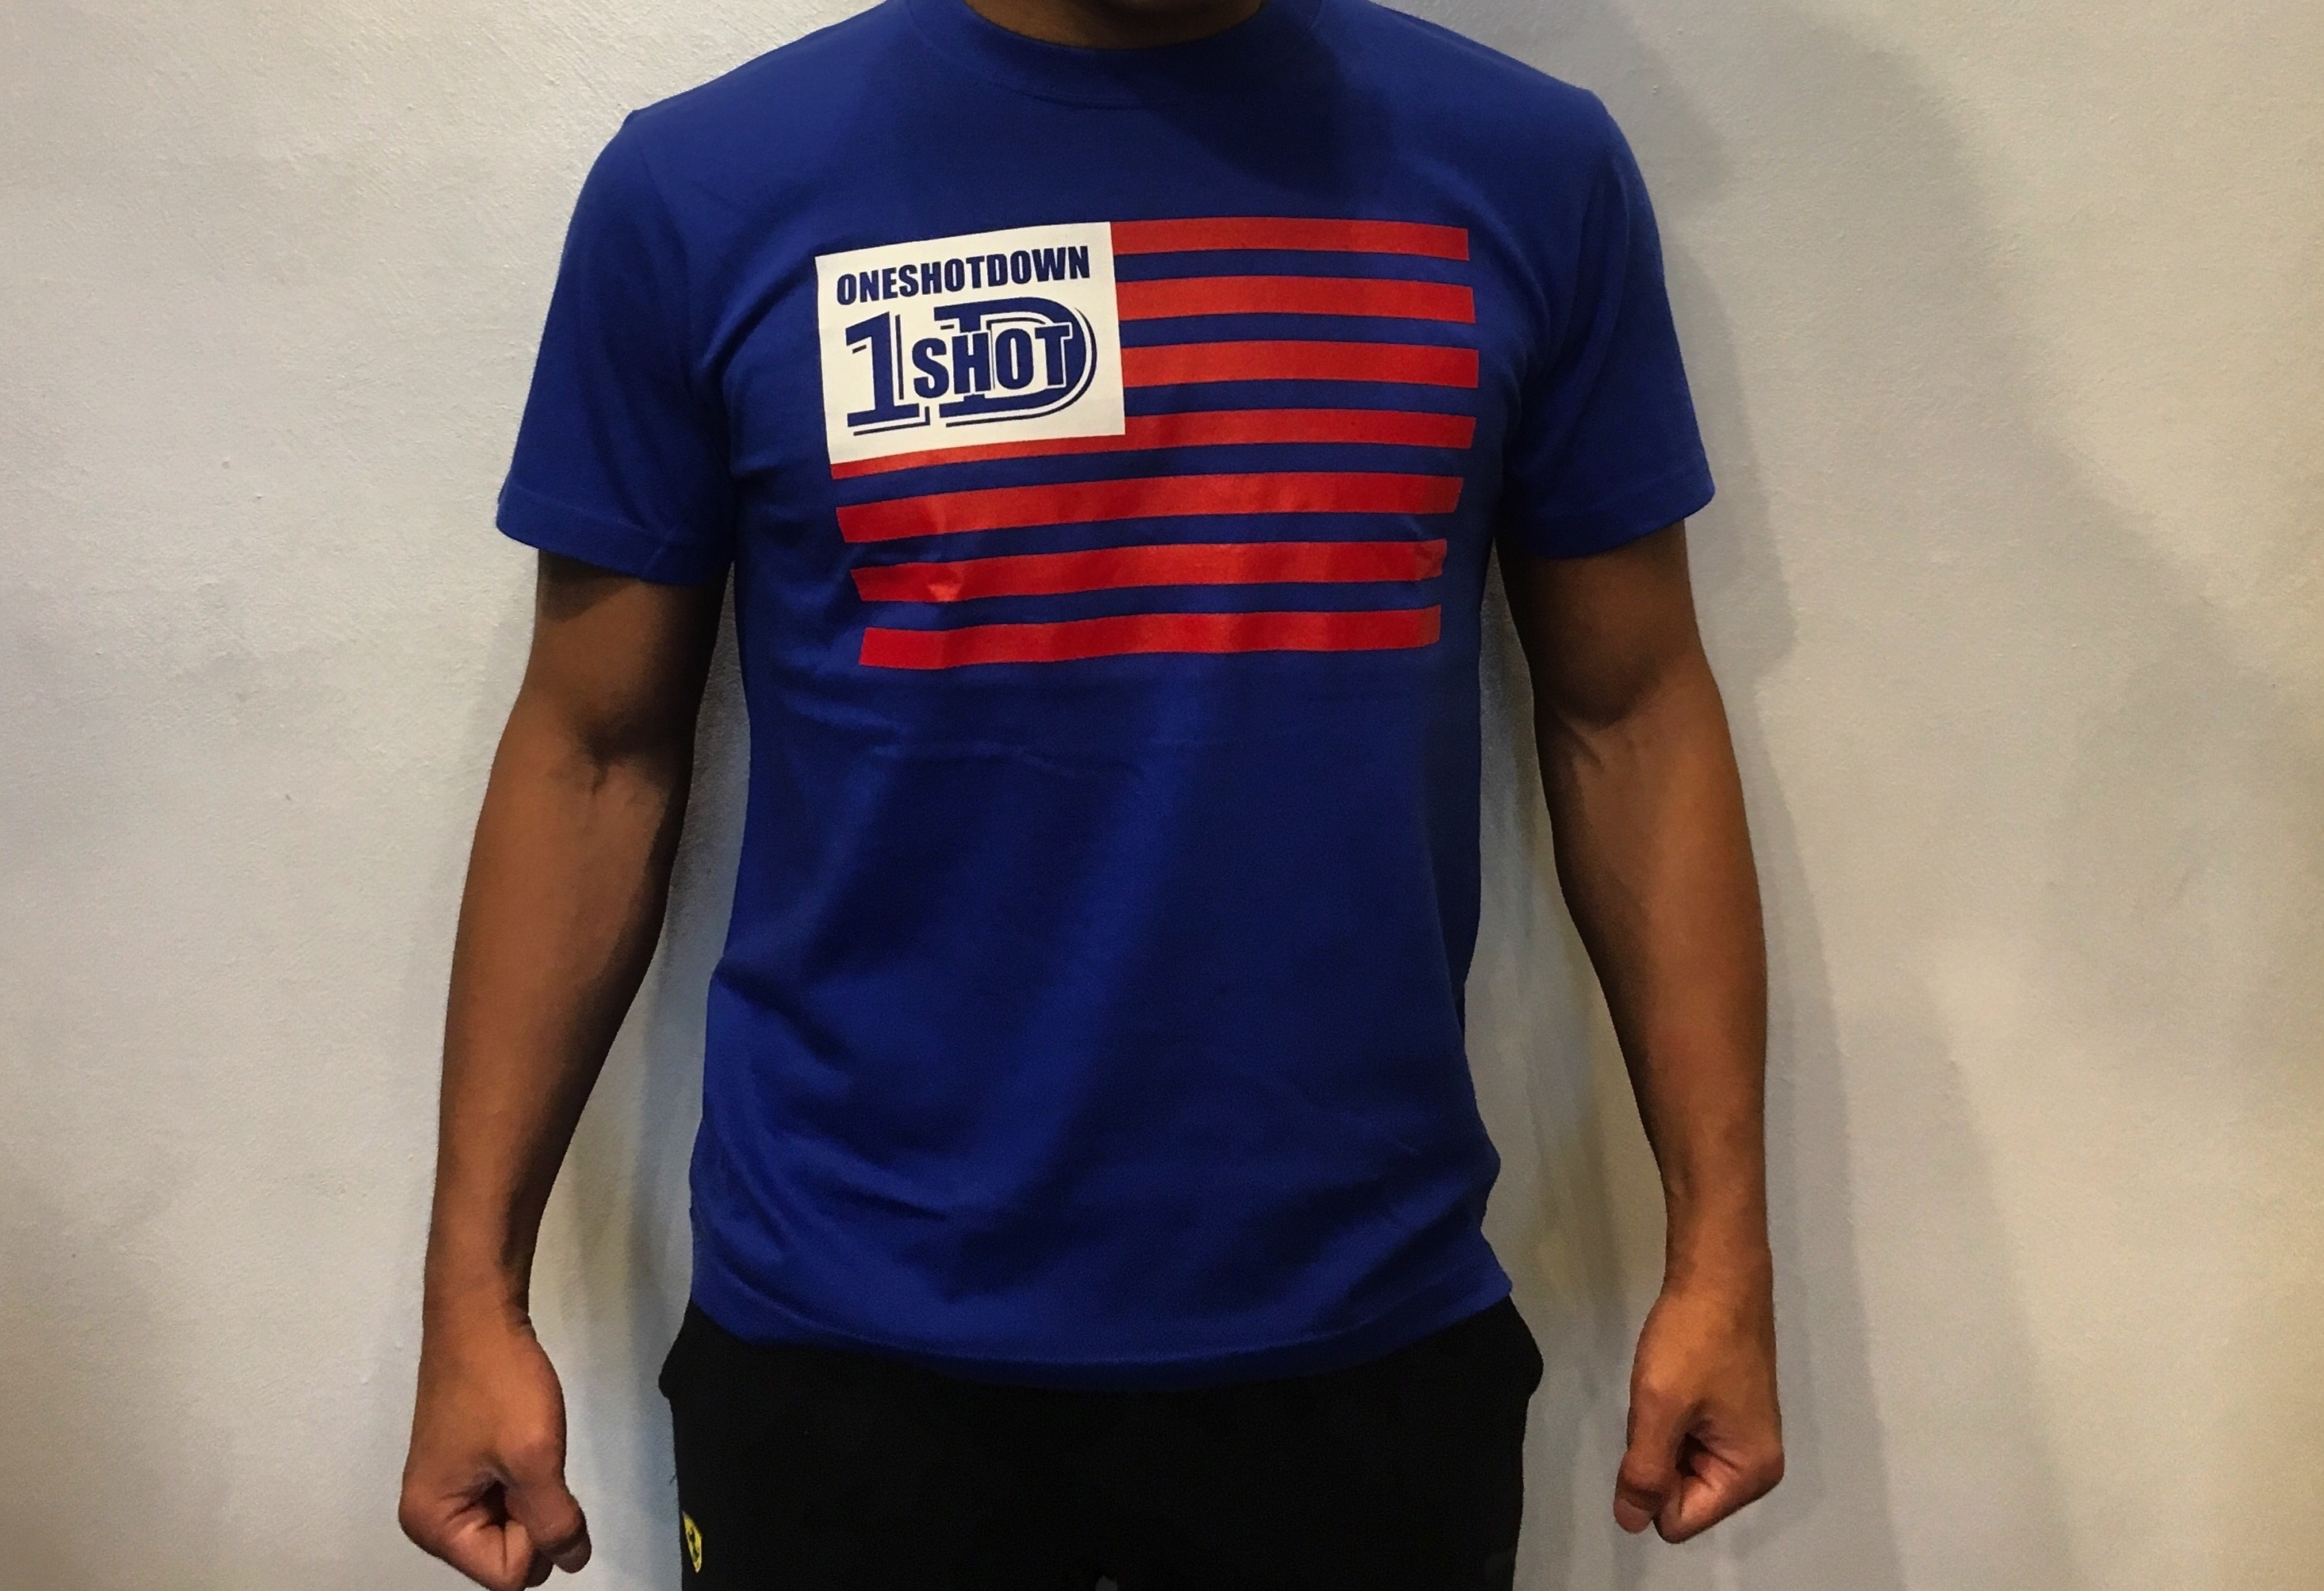 ONESHOTDOWN USA国旗デザインTシャツ - 画像3